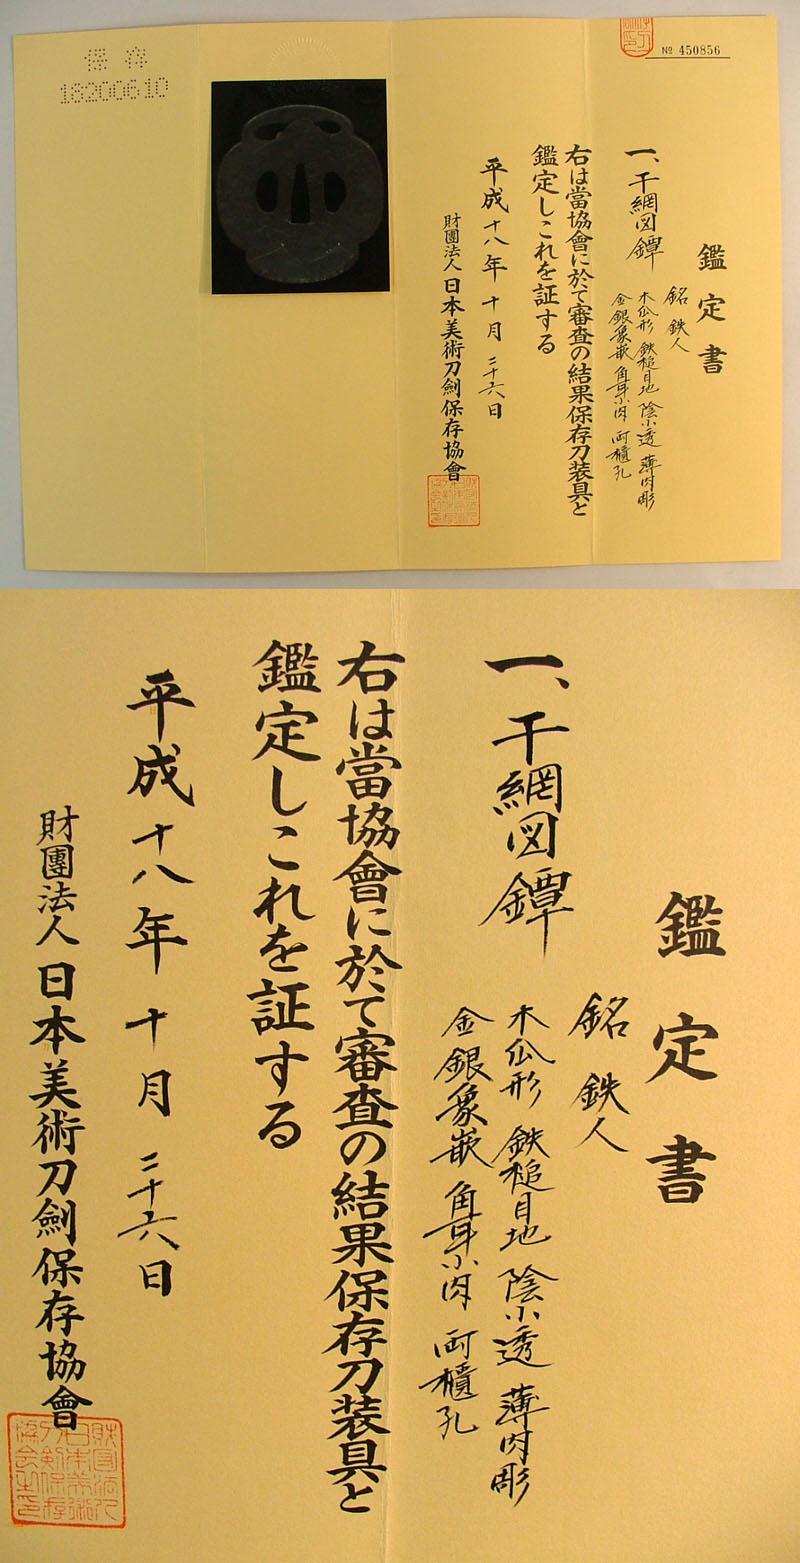 干綱図鐔 鉄人 Picture of Certificate